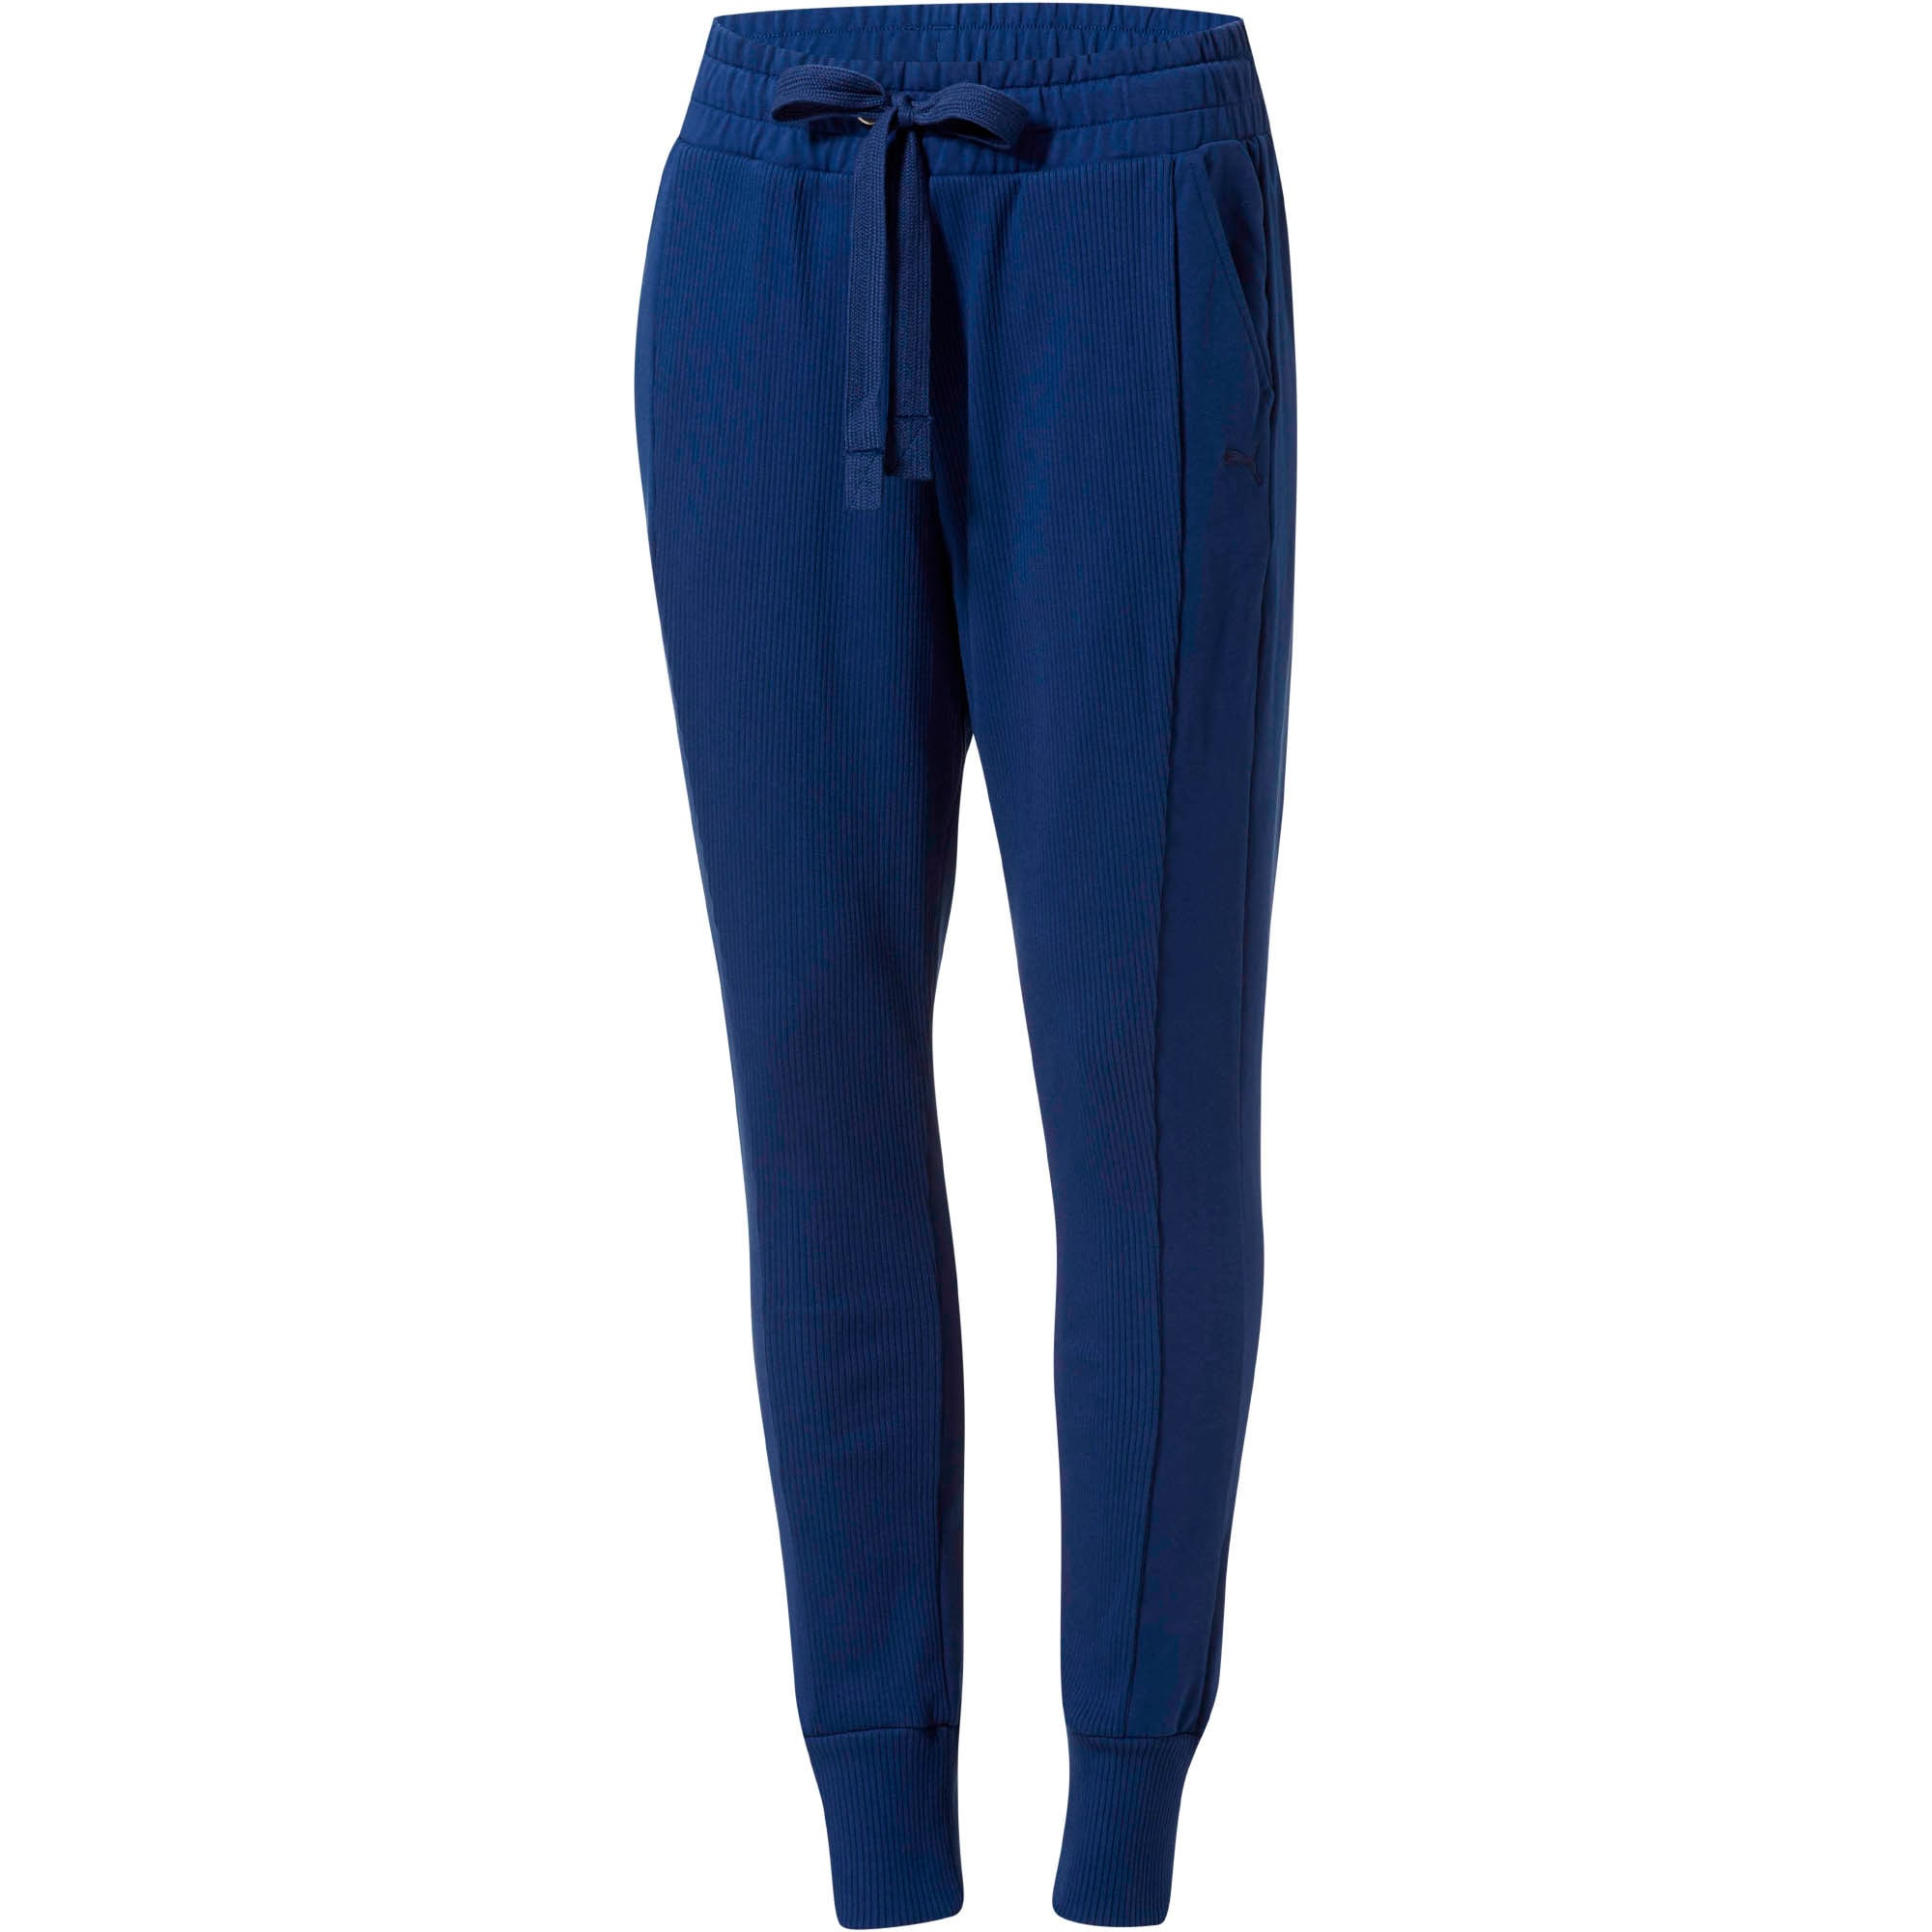 Thumbnail 1 of Fusion Sweatpants, Blue Depths, medium